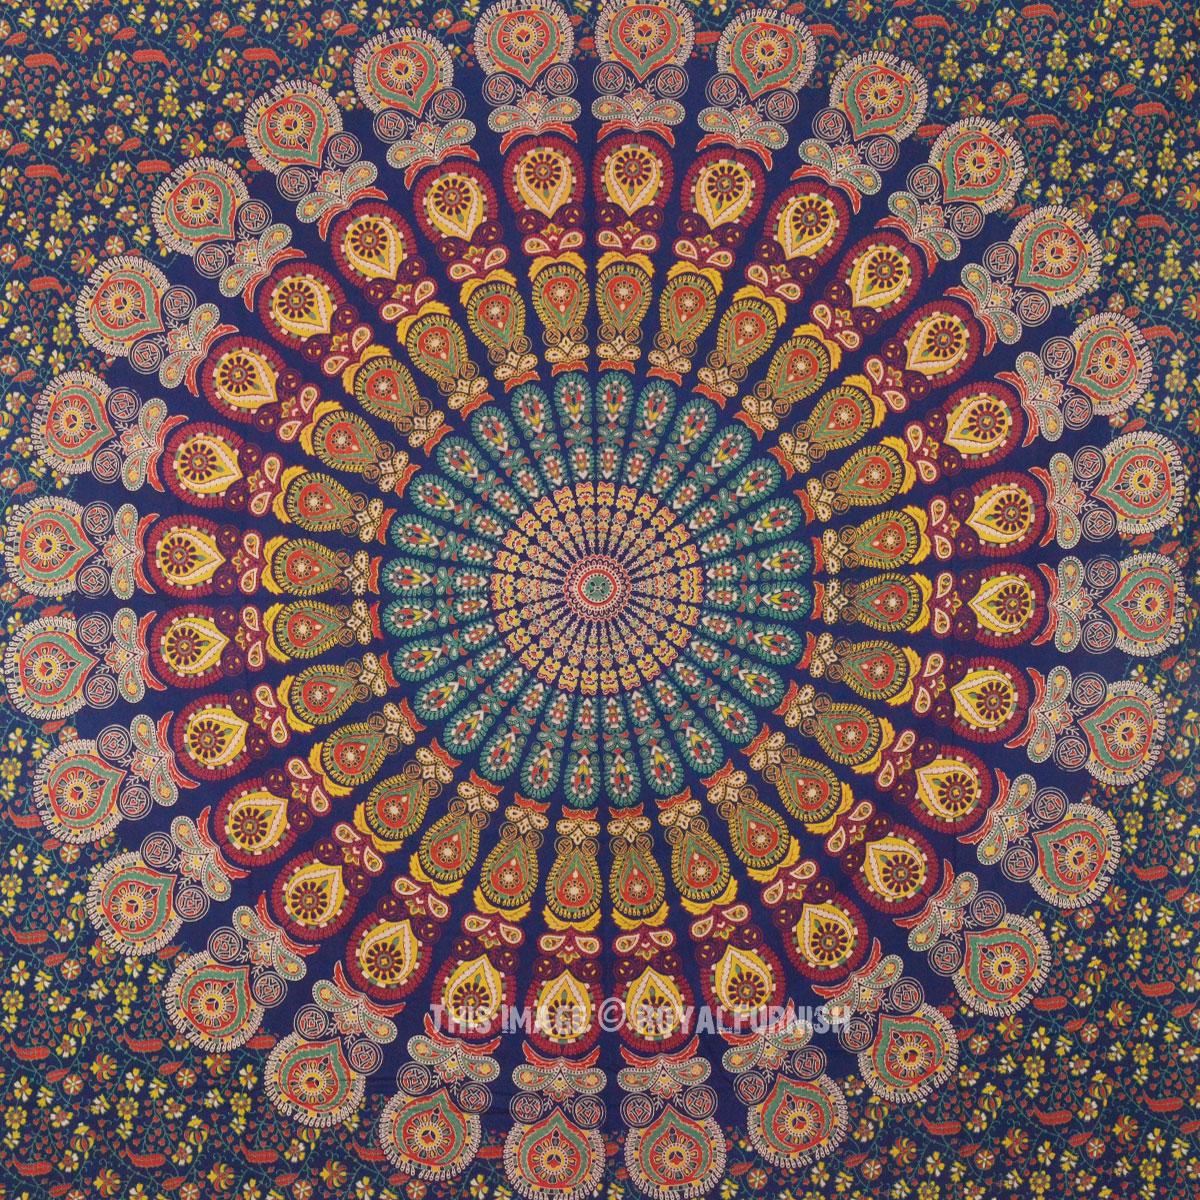 tie dye tapestry photo - 1